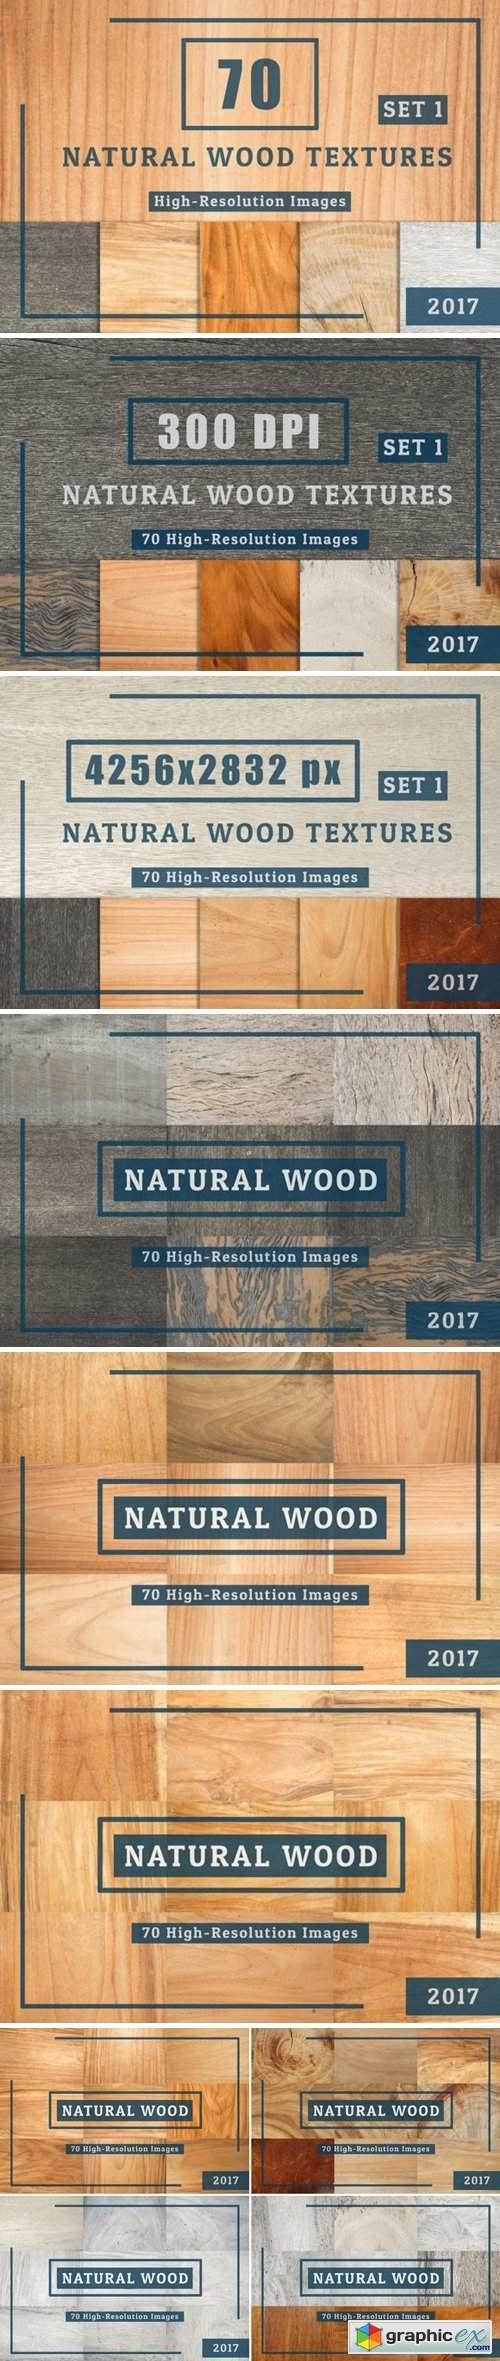 70 Natural Wood Table Textures Set 1